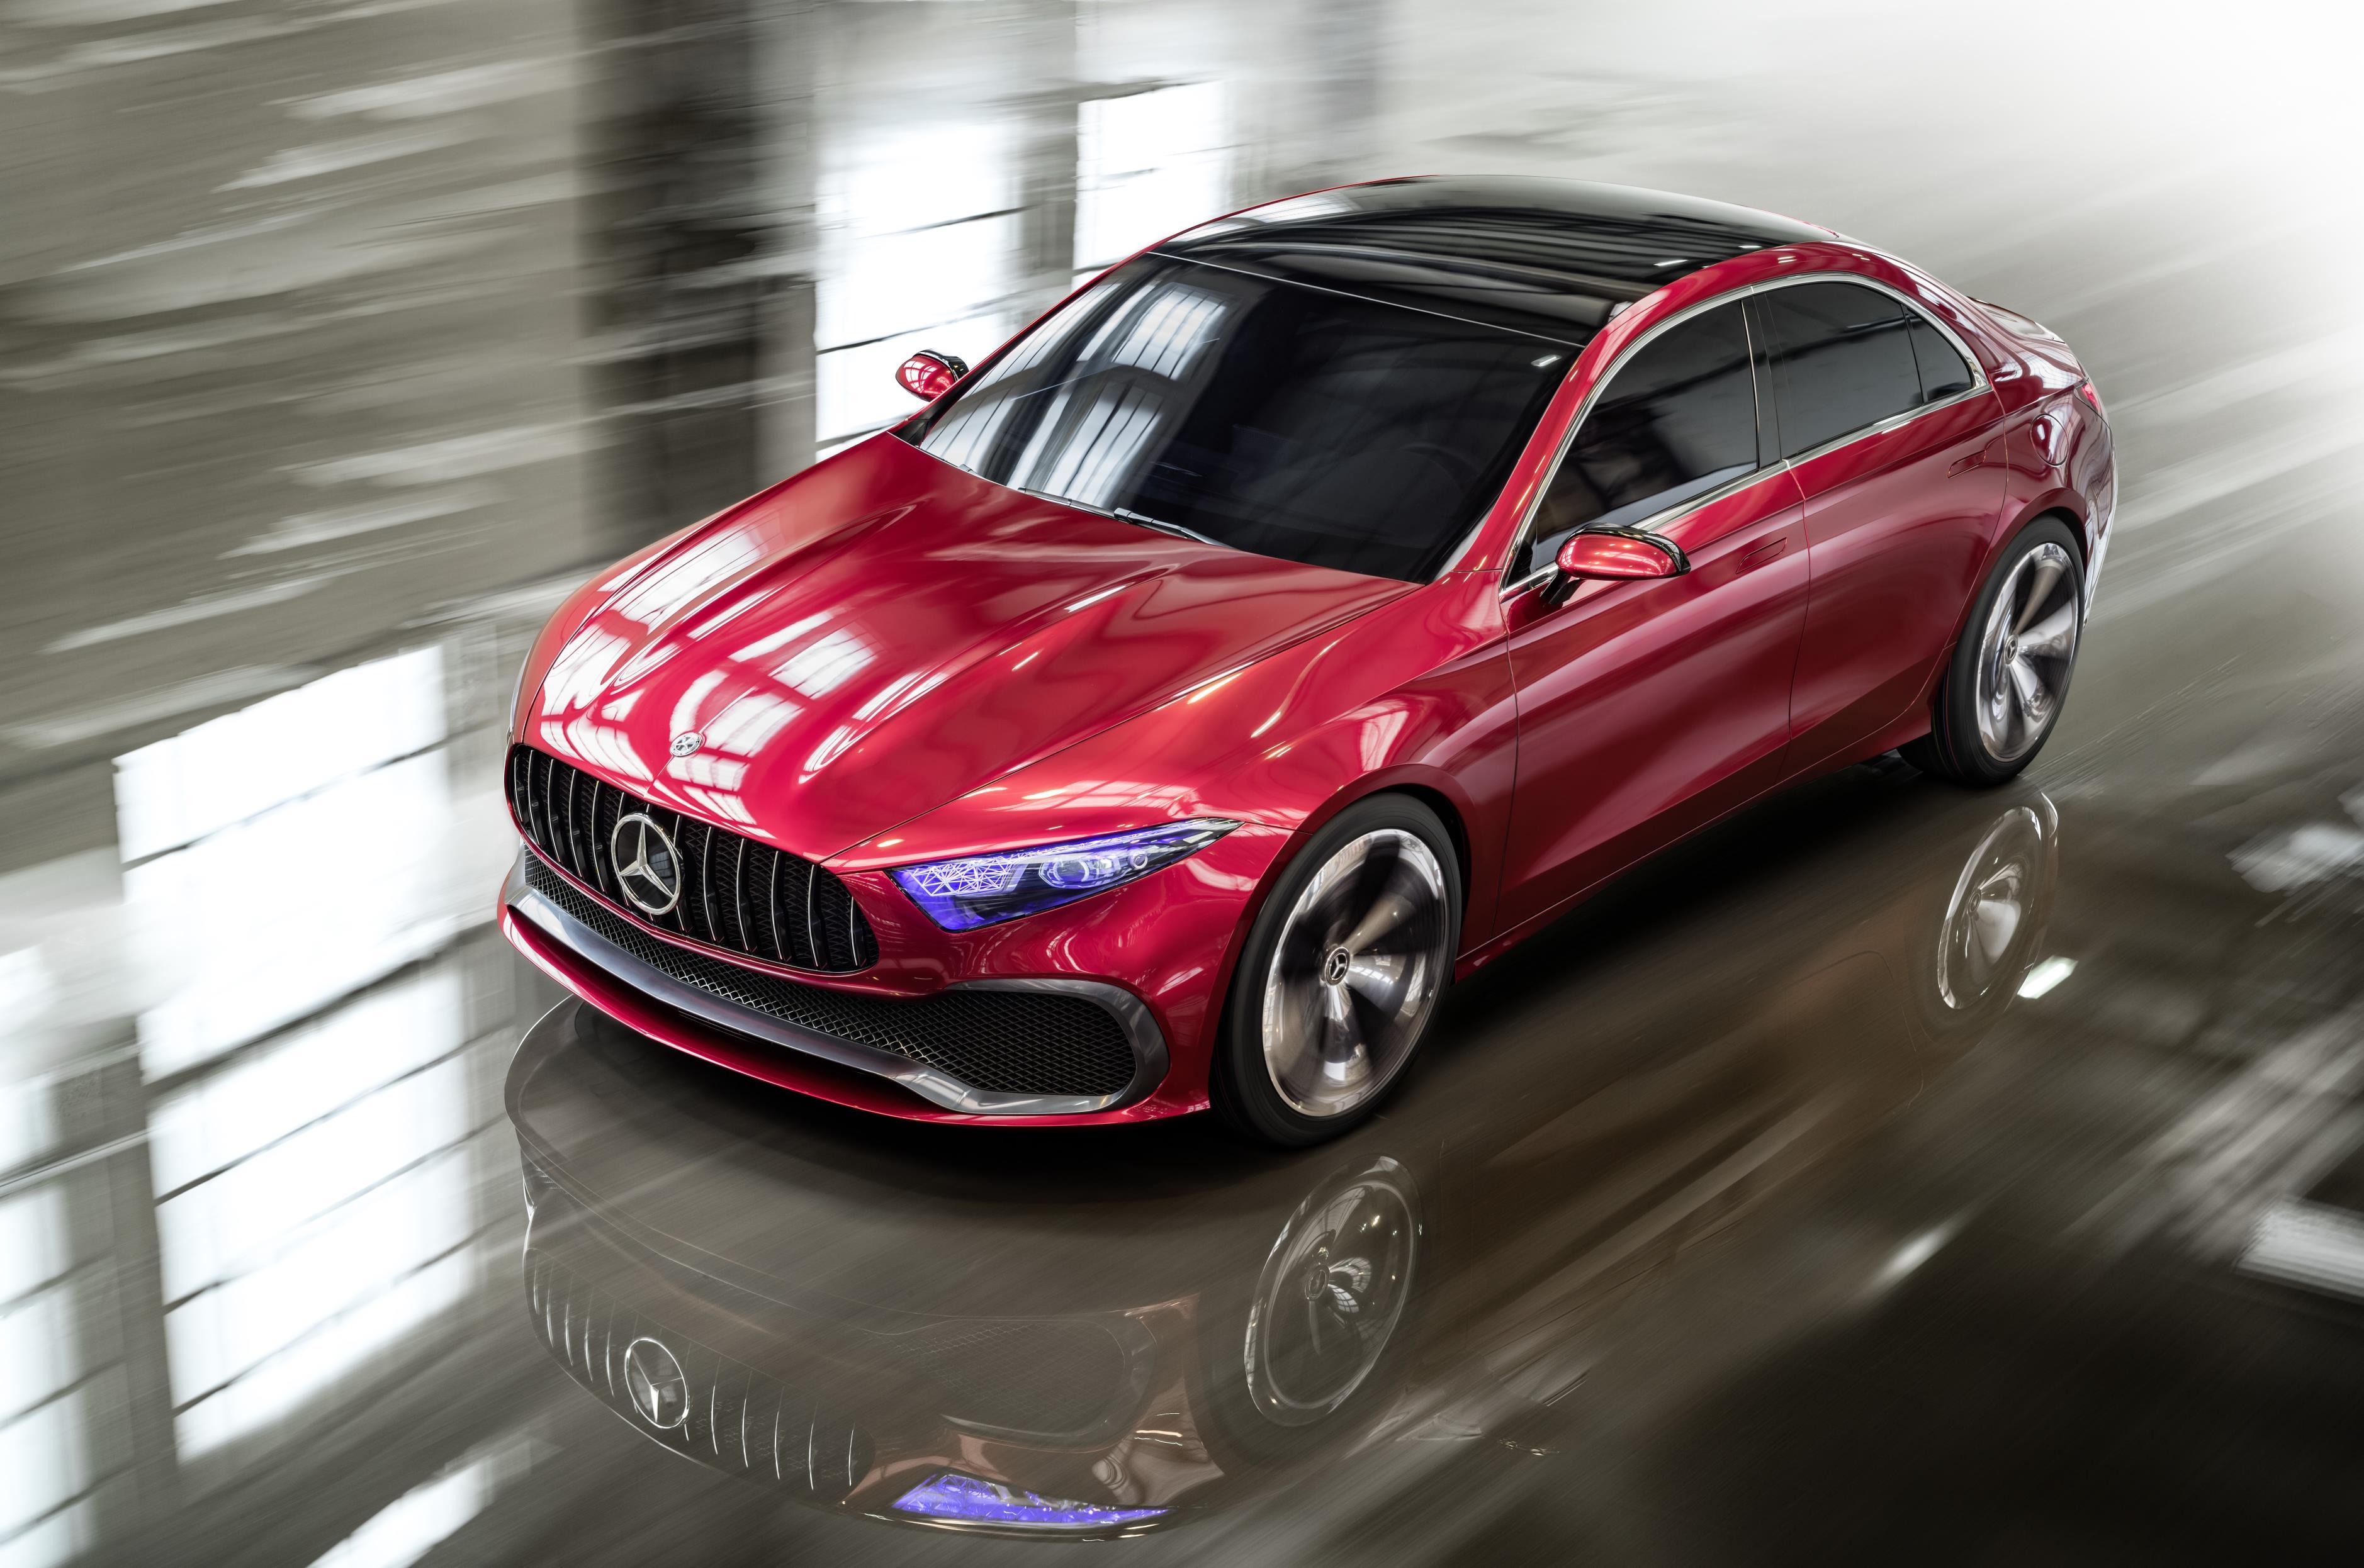 Koncept limuzine Mercedes-Benz razreda A